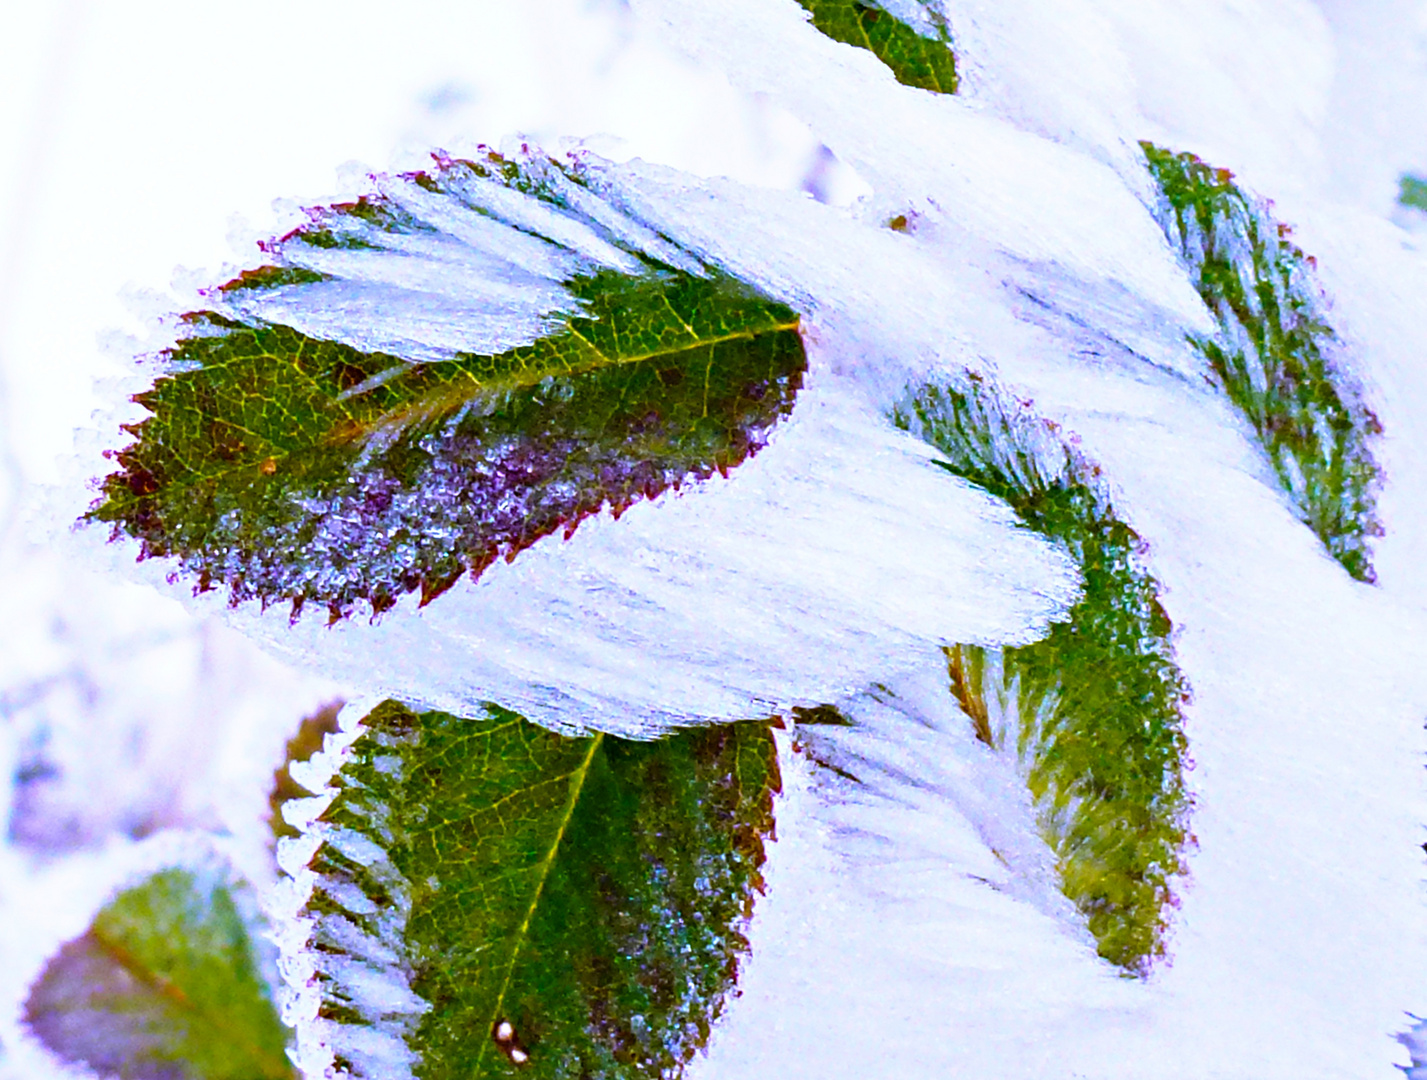 Eisblätter - Der Winter malt bereits...